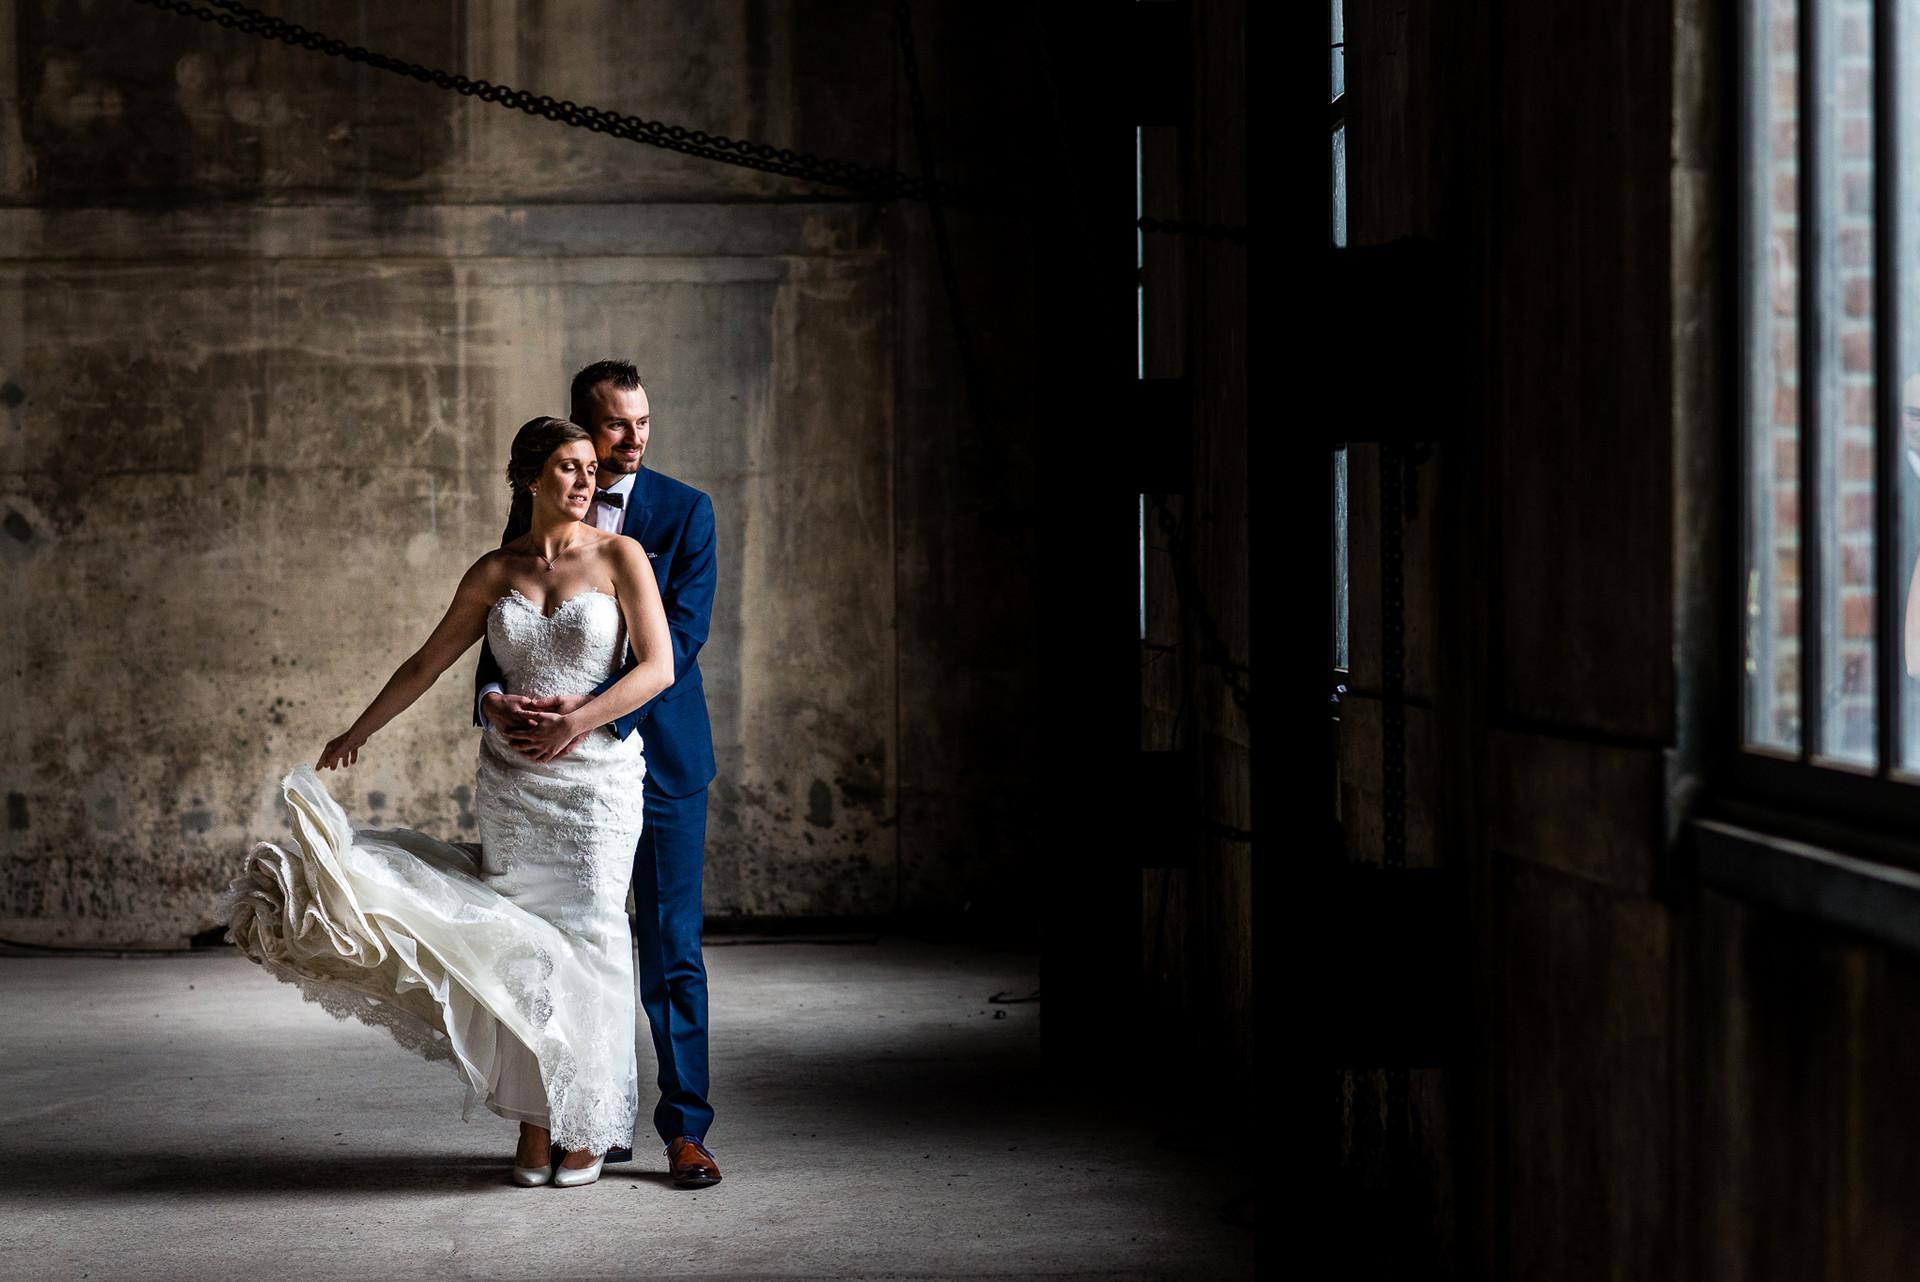 huwelijksfotograaf transfo zwevegem